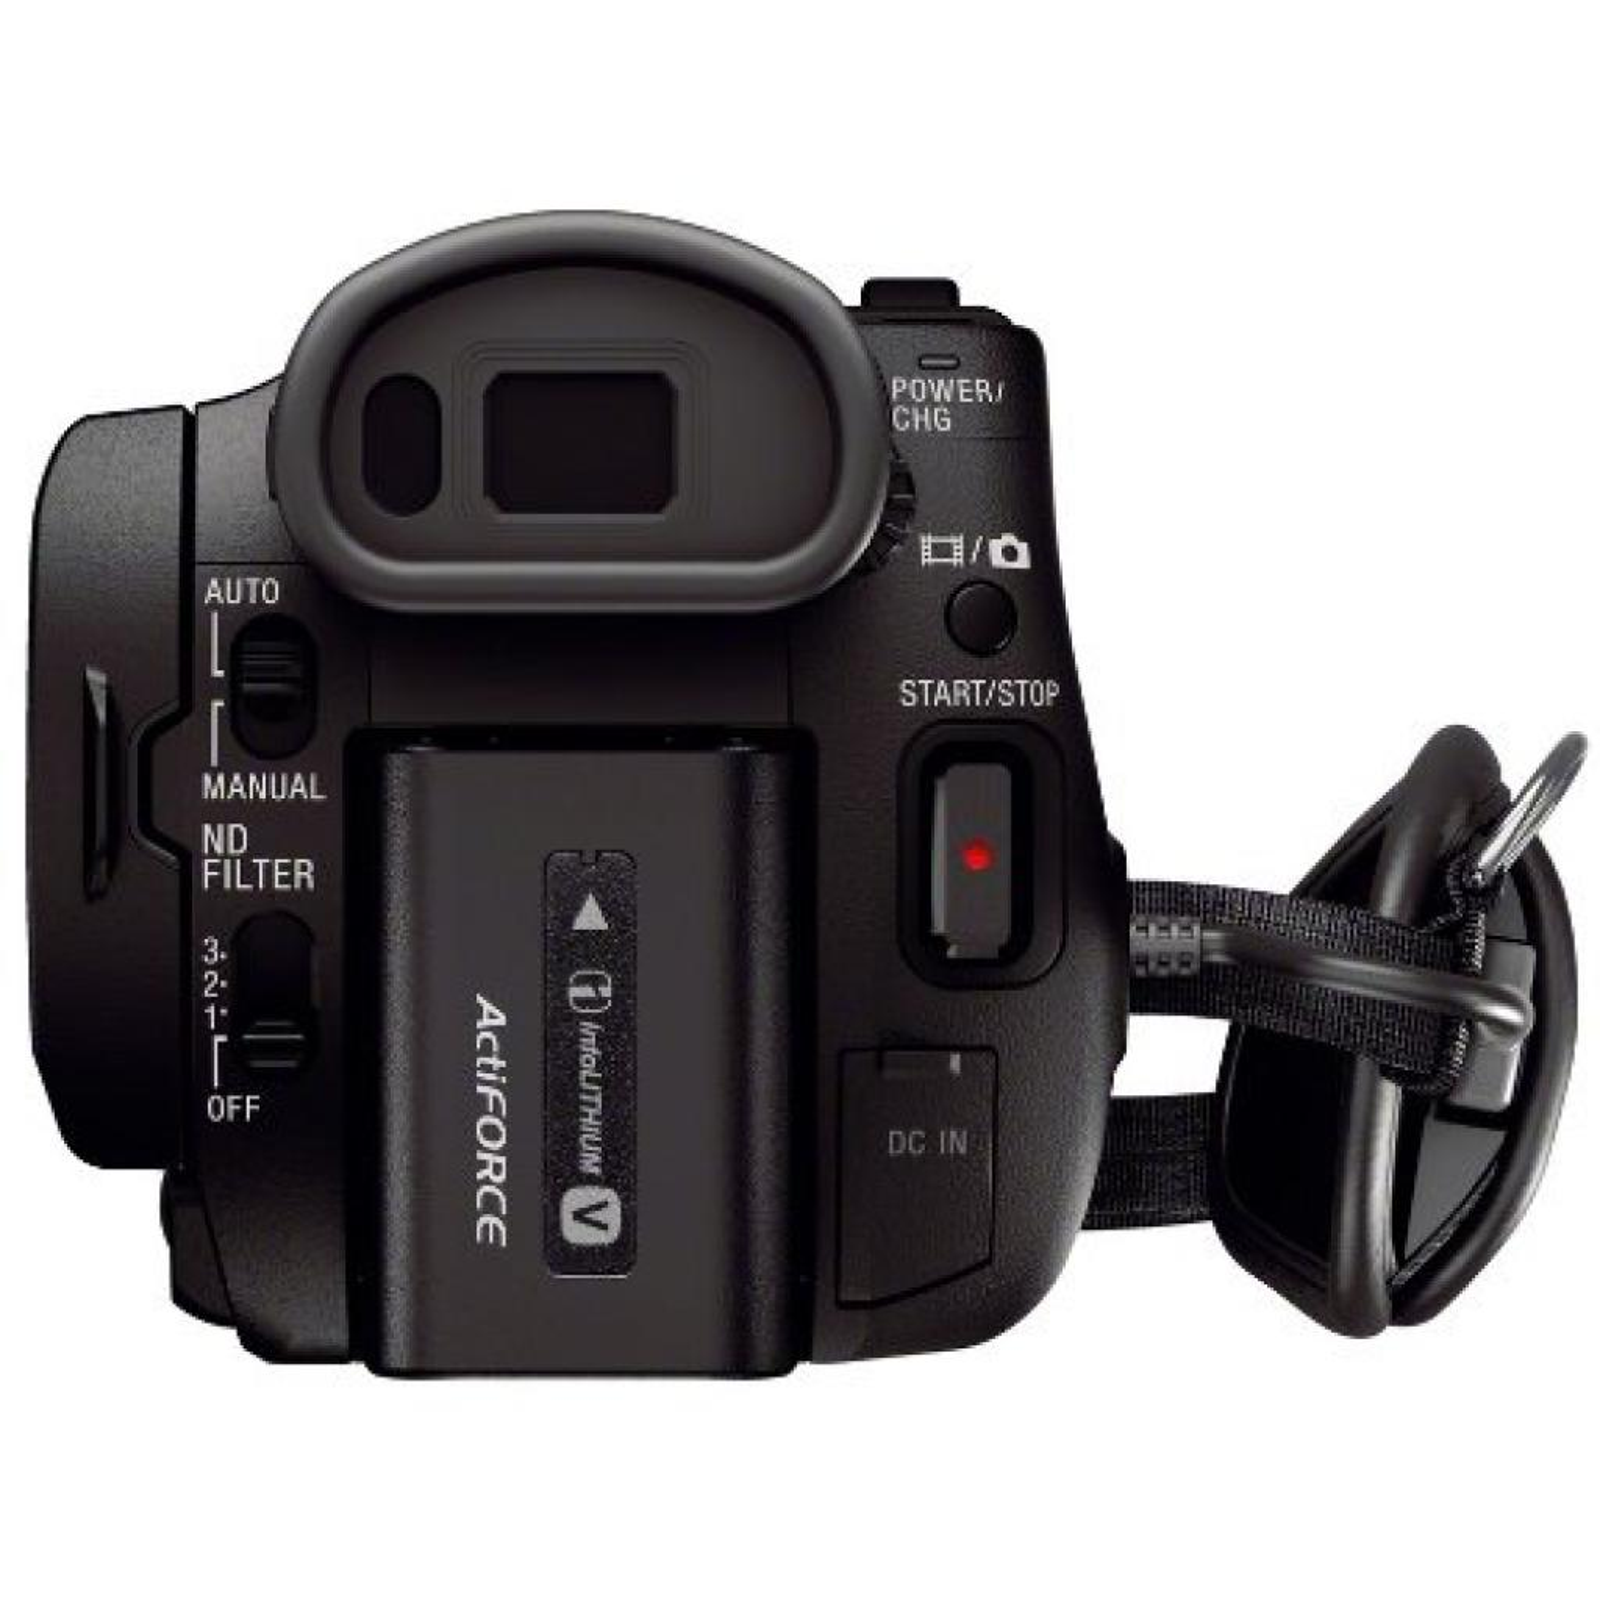 Цифровая видеокамера SONY Handycam HDR-CX900 Black (HDRCX900EB.CEN) изображение 8